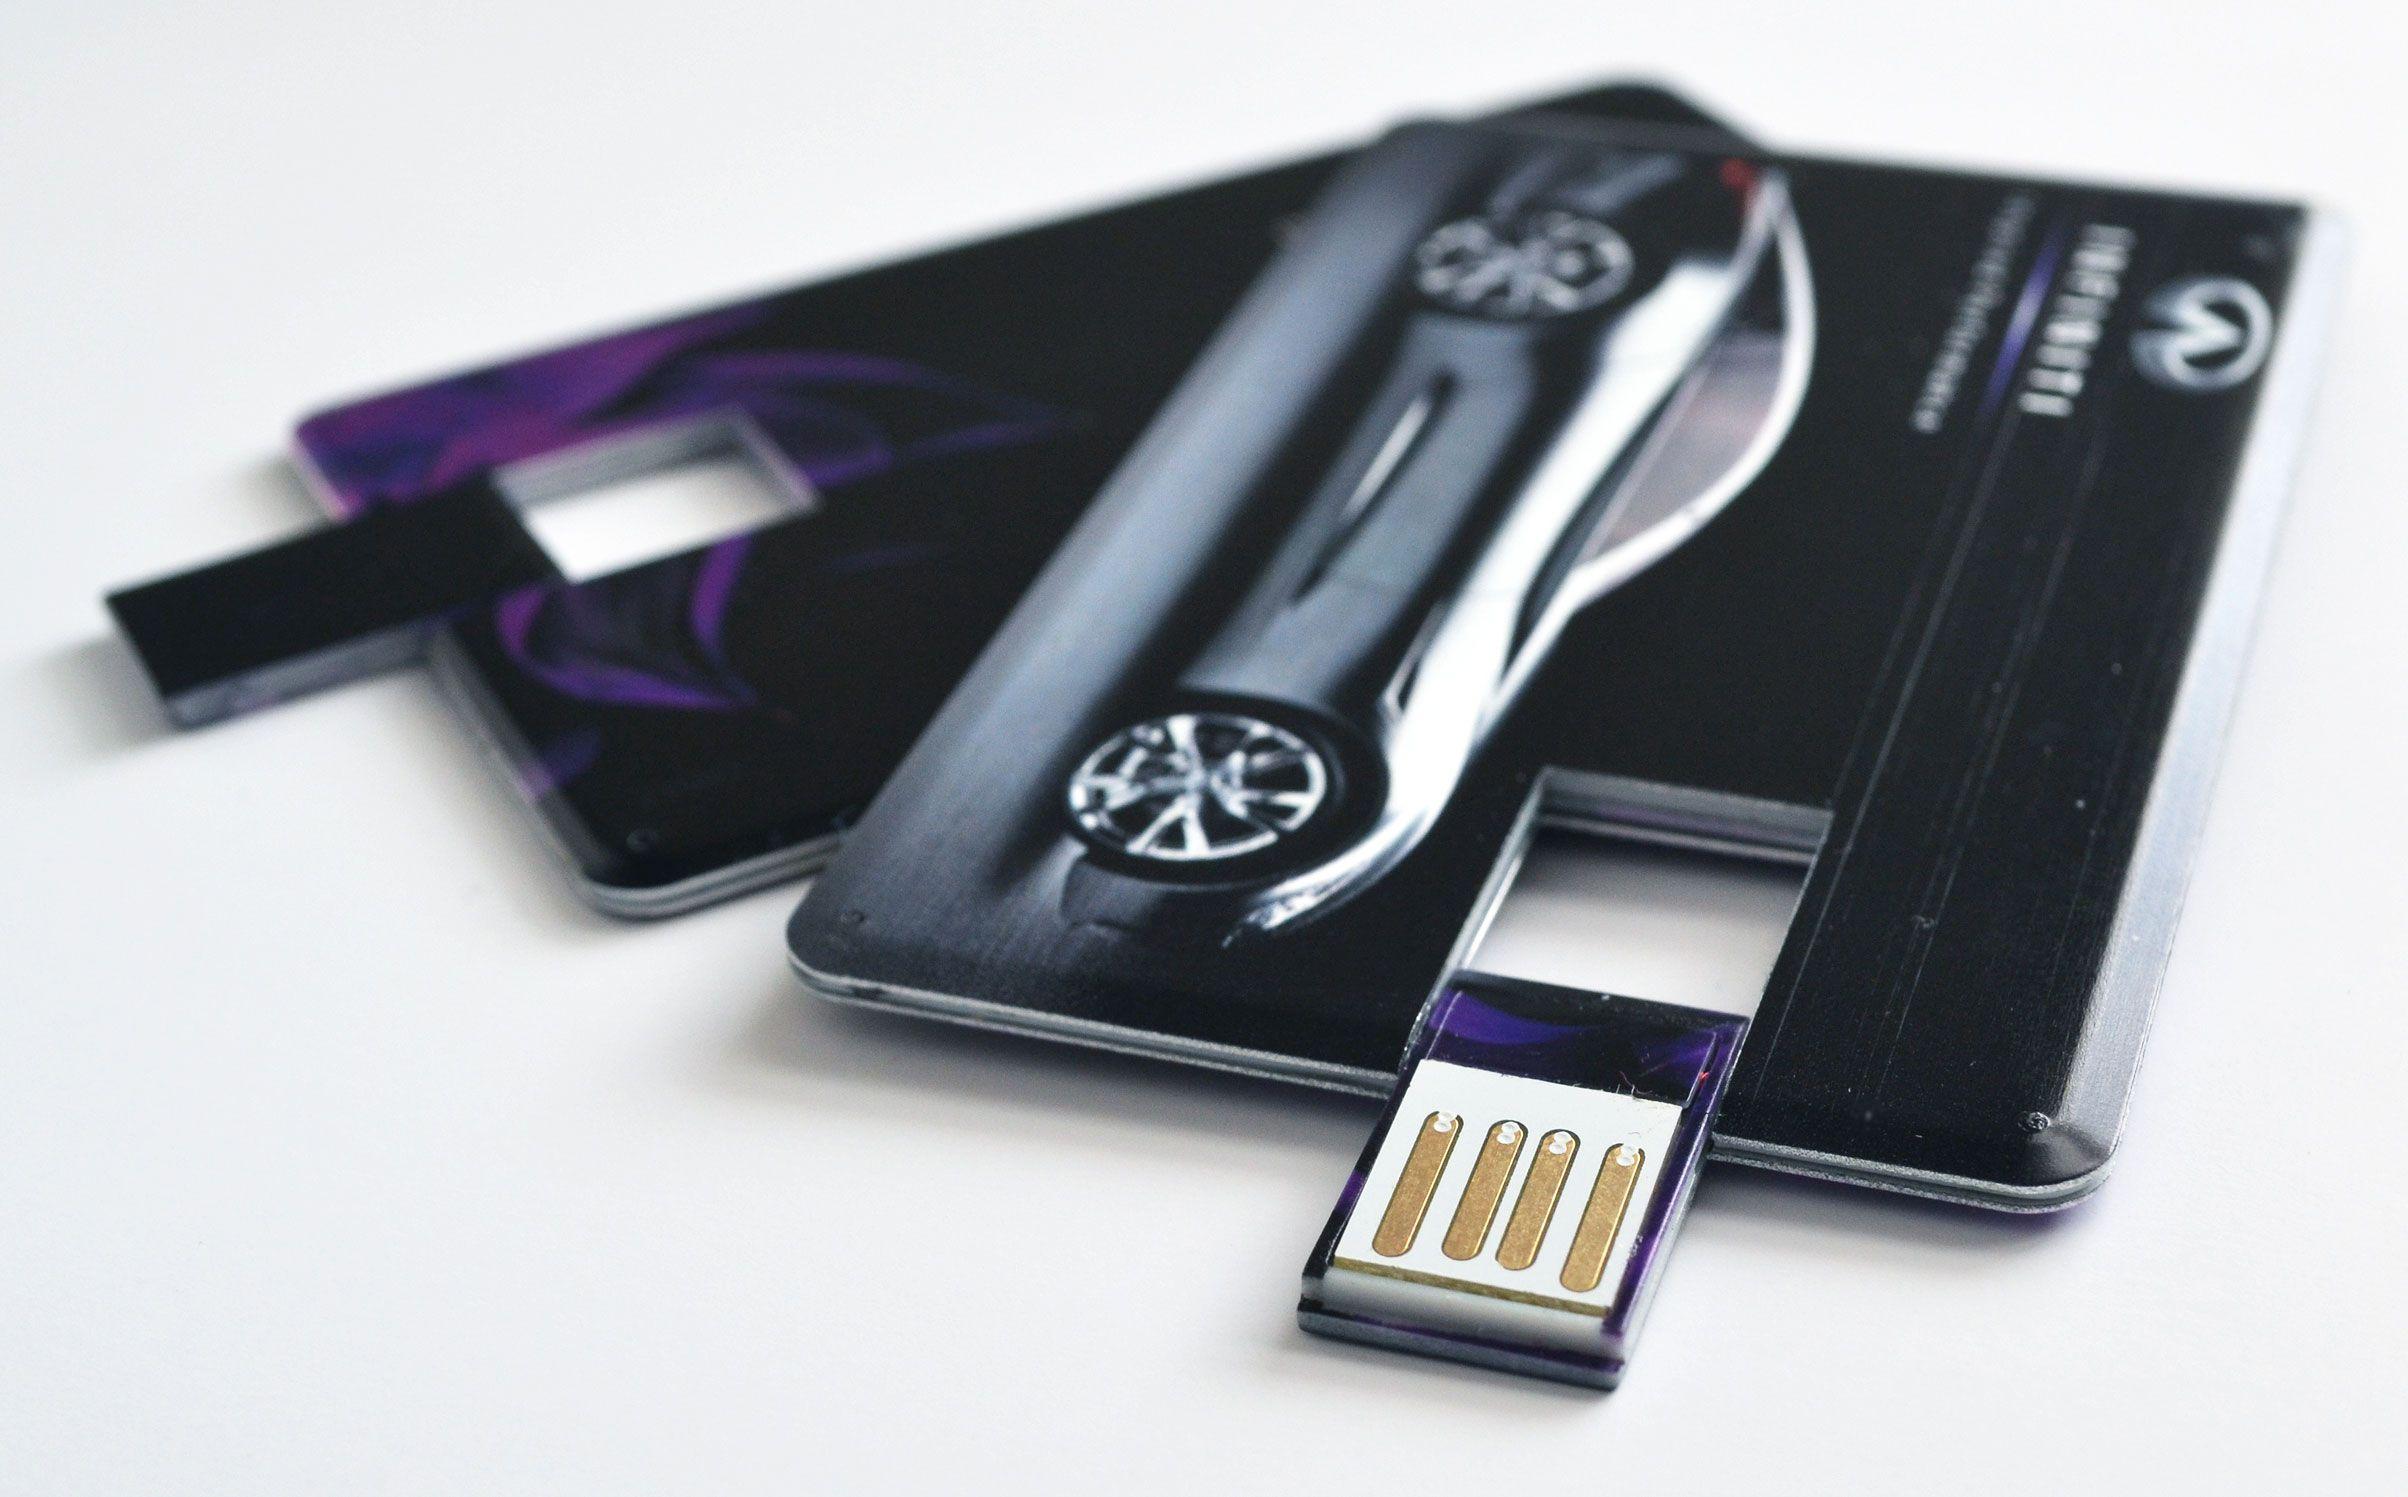 Cheap Custom Usb Credit Card Usb Low Cost Flash Drives Thumb Drive Custom Usb Drives Custom Usb